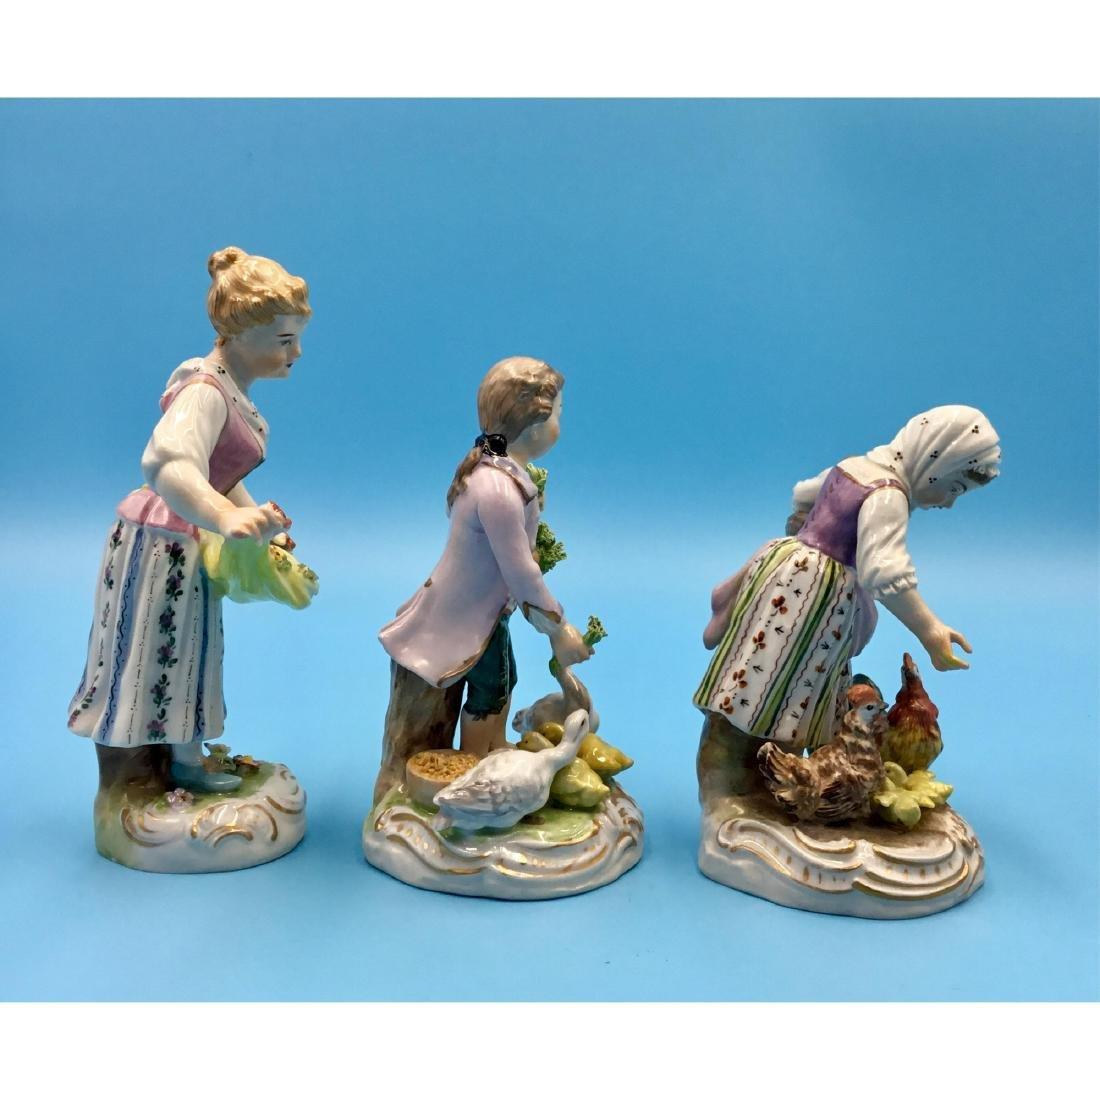 GROUP OF 3 DRESDEN GERMAN PORCELAIN FIGURINES - 4